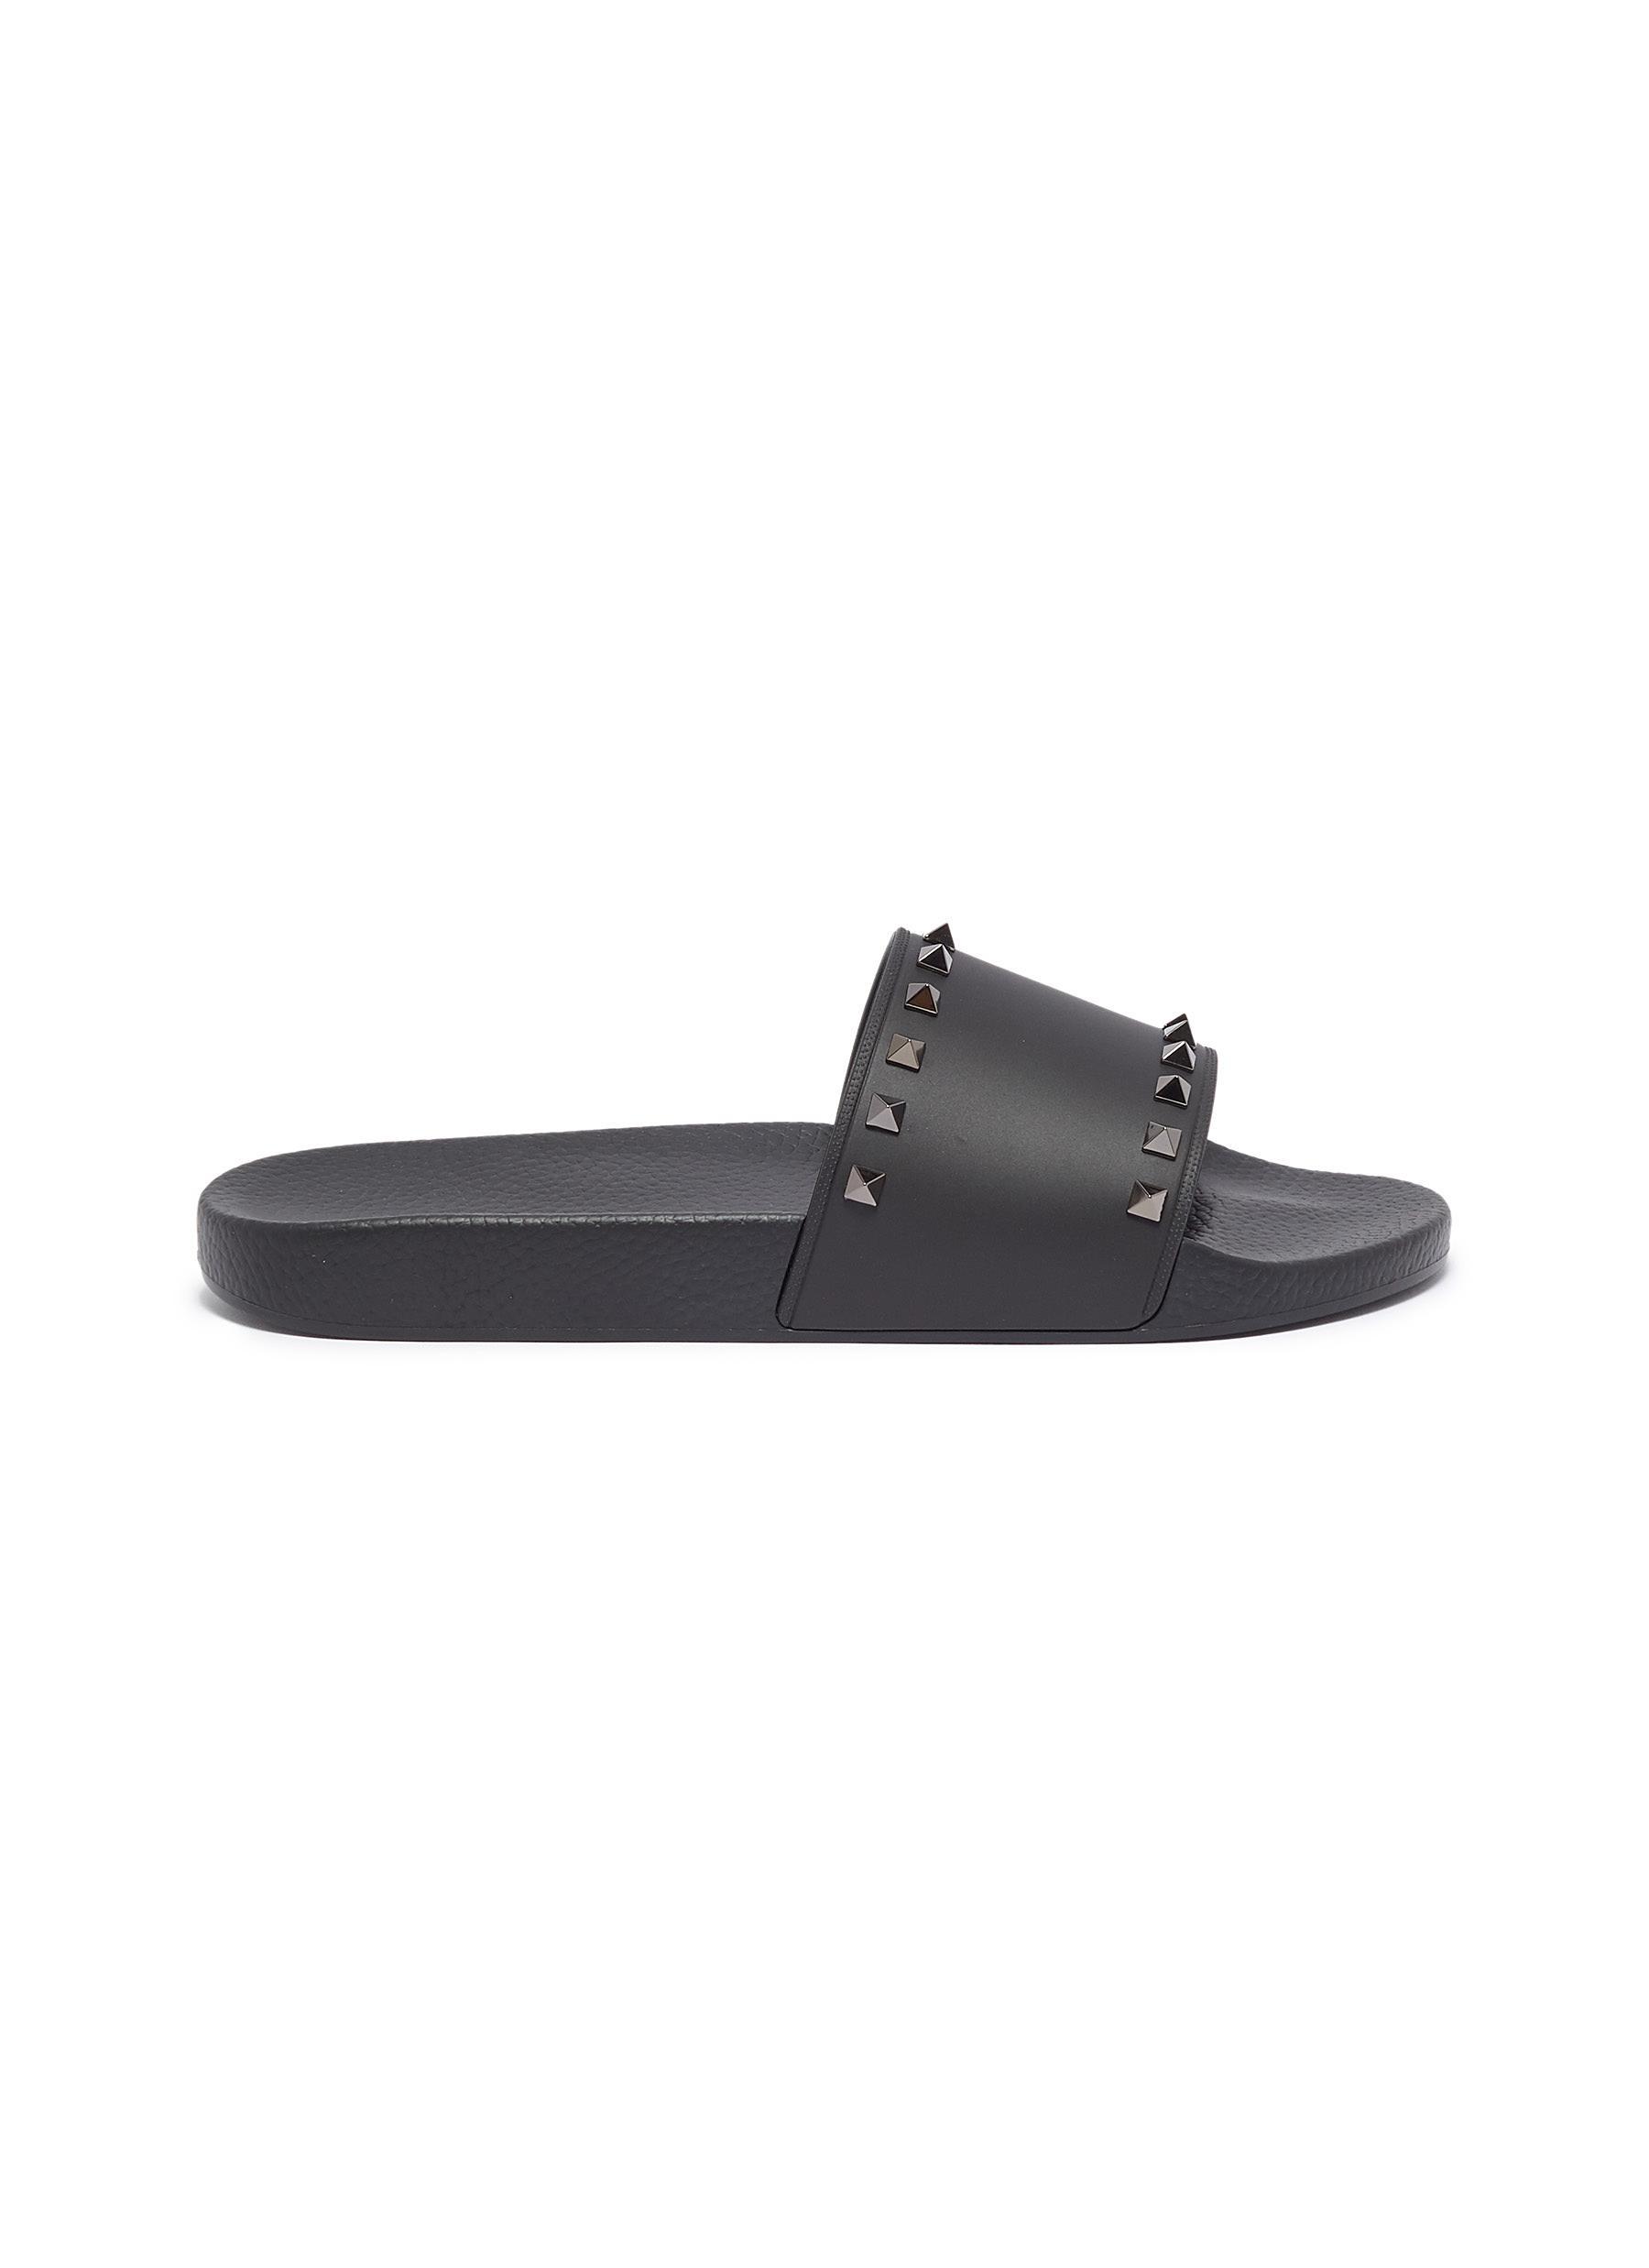 d191c05b8100 Main View - Click To Enlarge - Valentino - Rockstud slide sandals